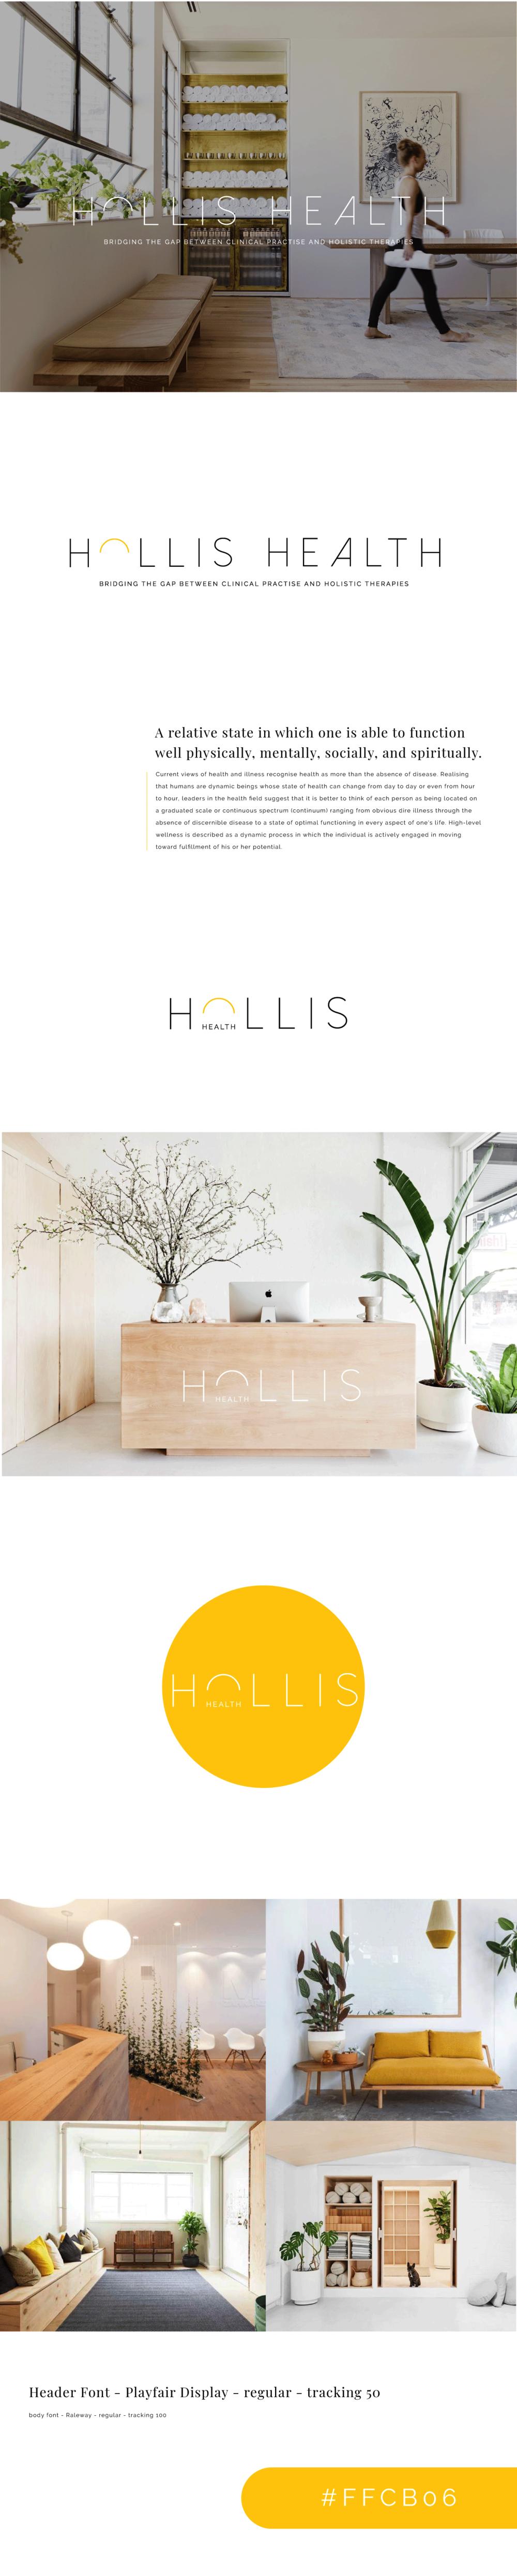 HOLLIS HEALTH BRAND GUIDELINE - IMO CREATIVE.png